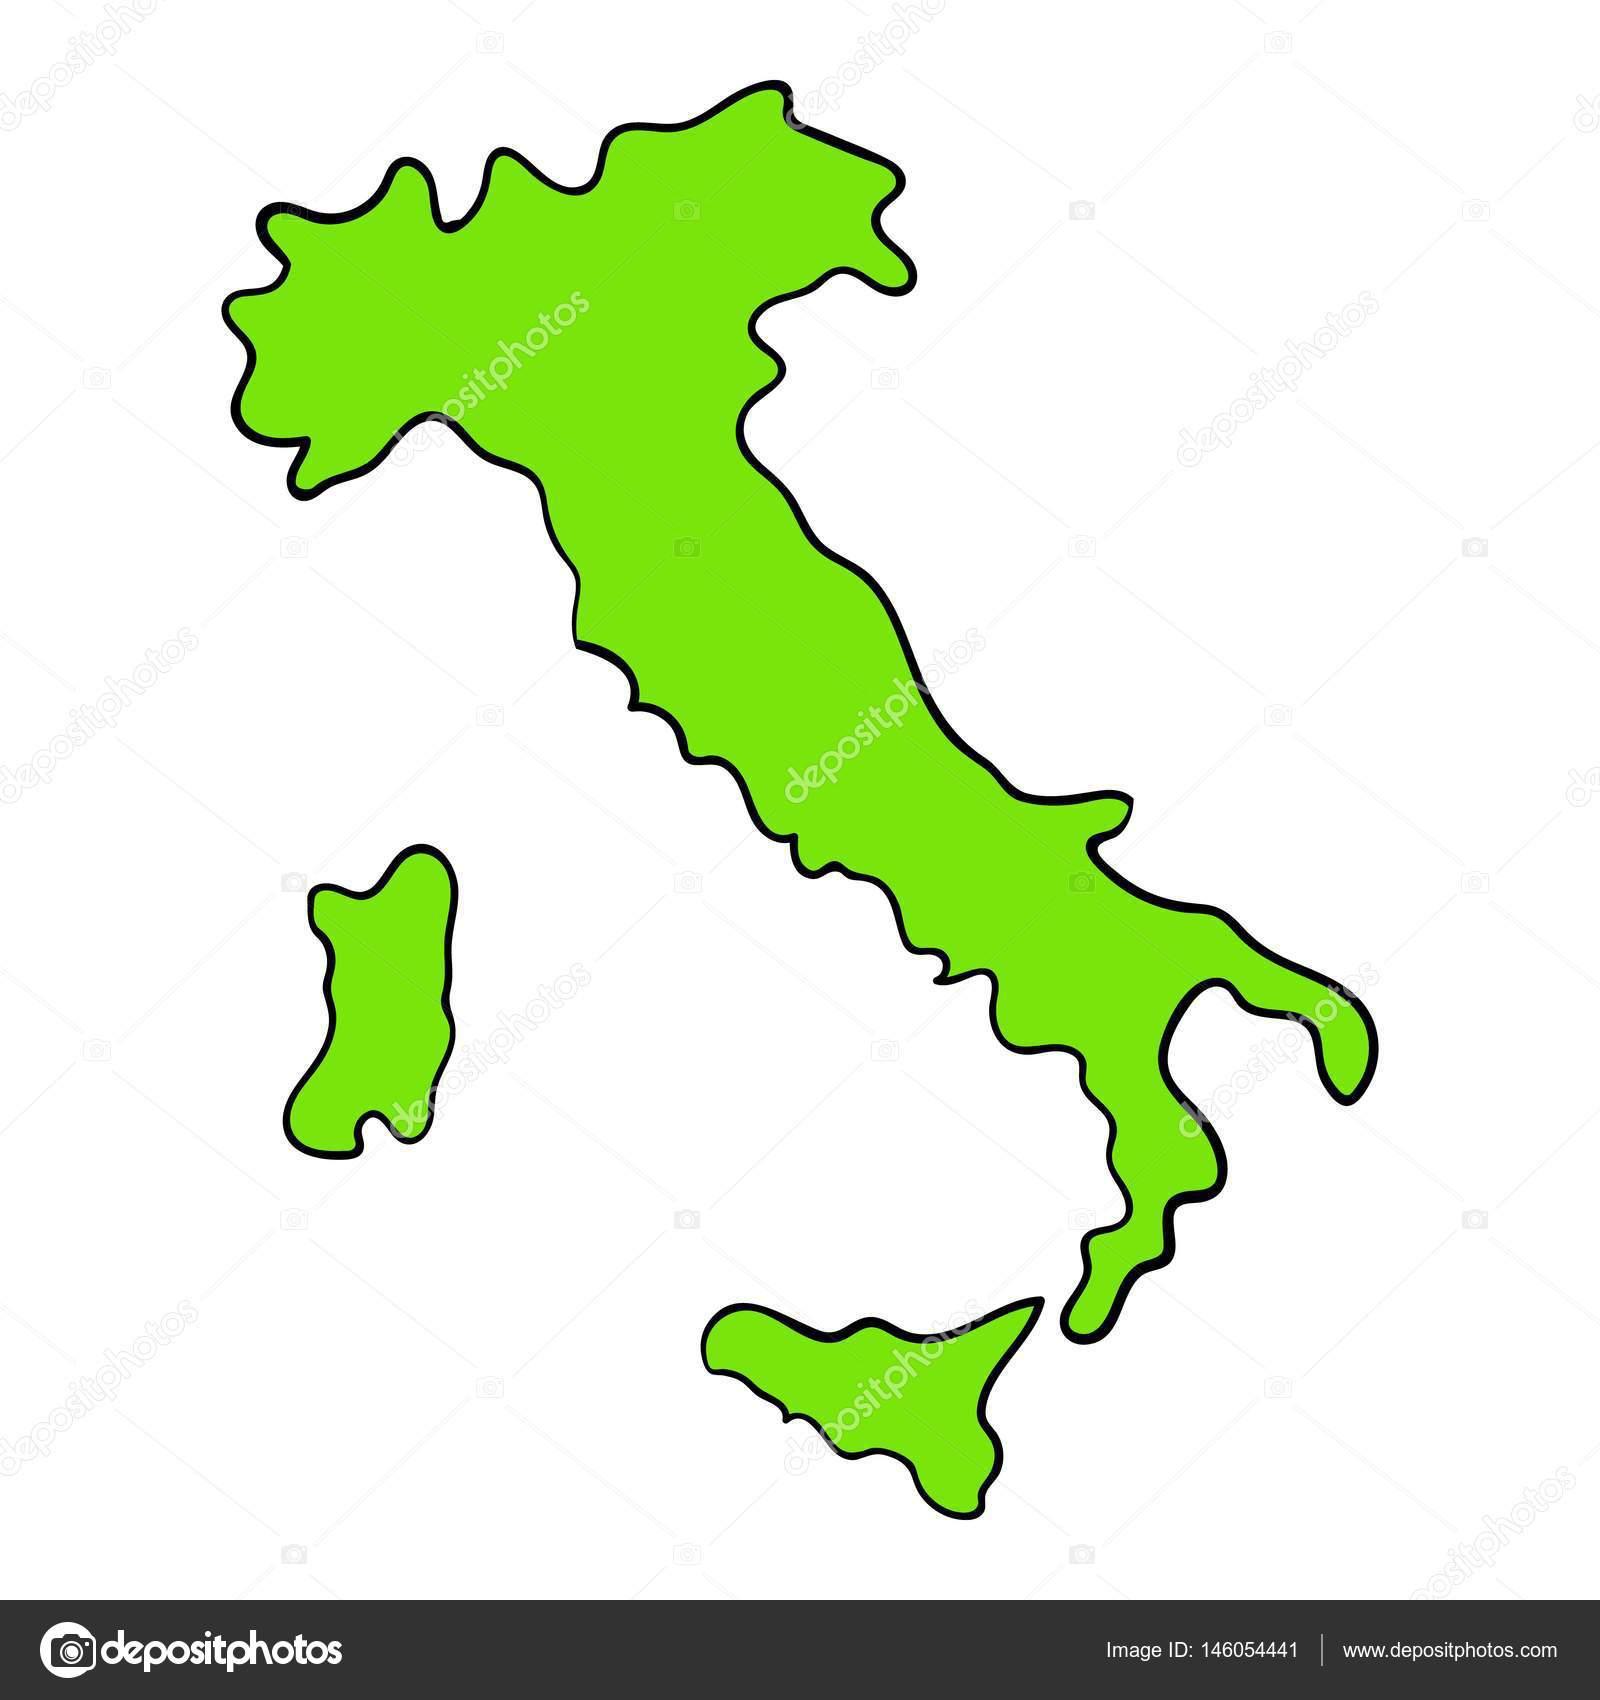 Dibujos animados de icono de mapa verde Italia — Archivo Imágenes